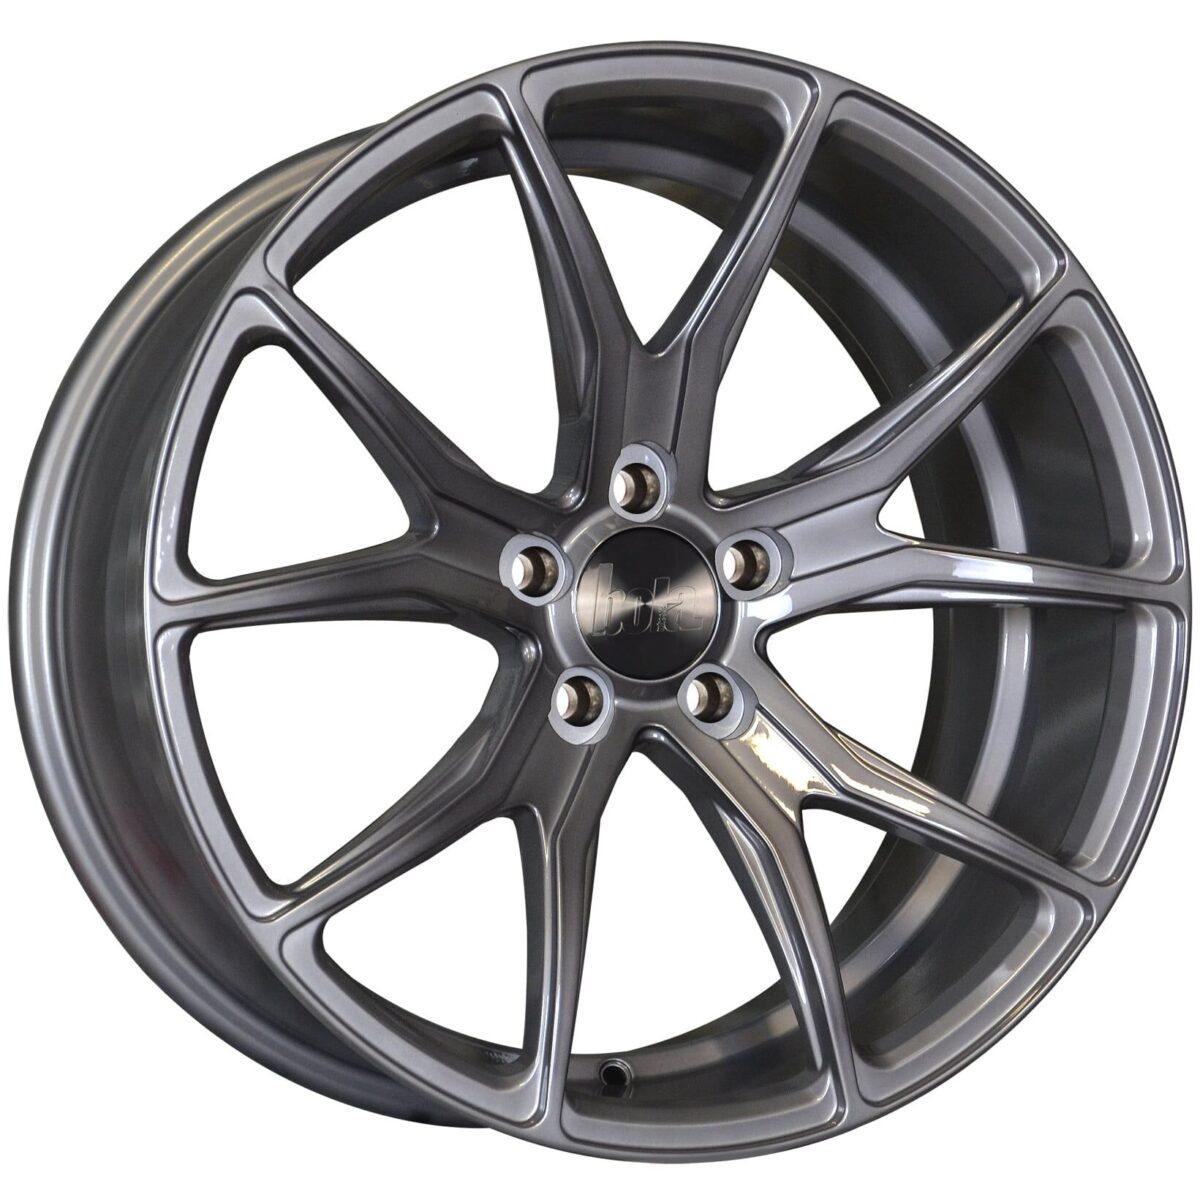 "18"" BOLA B6 Wheels - Gloss Titanium - All BMW Models"